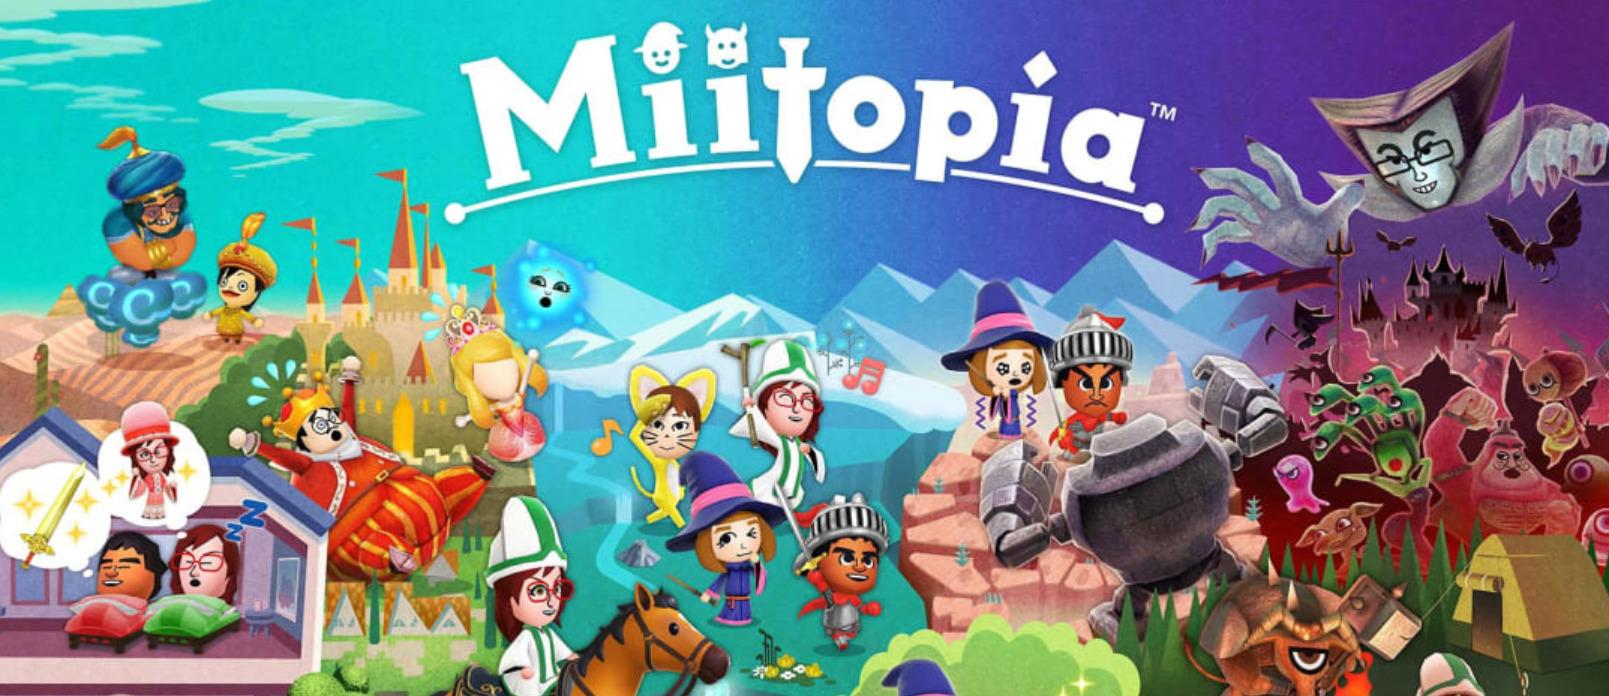 Nintendo Switch Miitopia Image